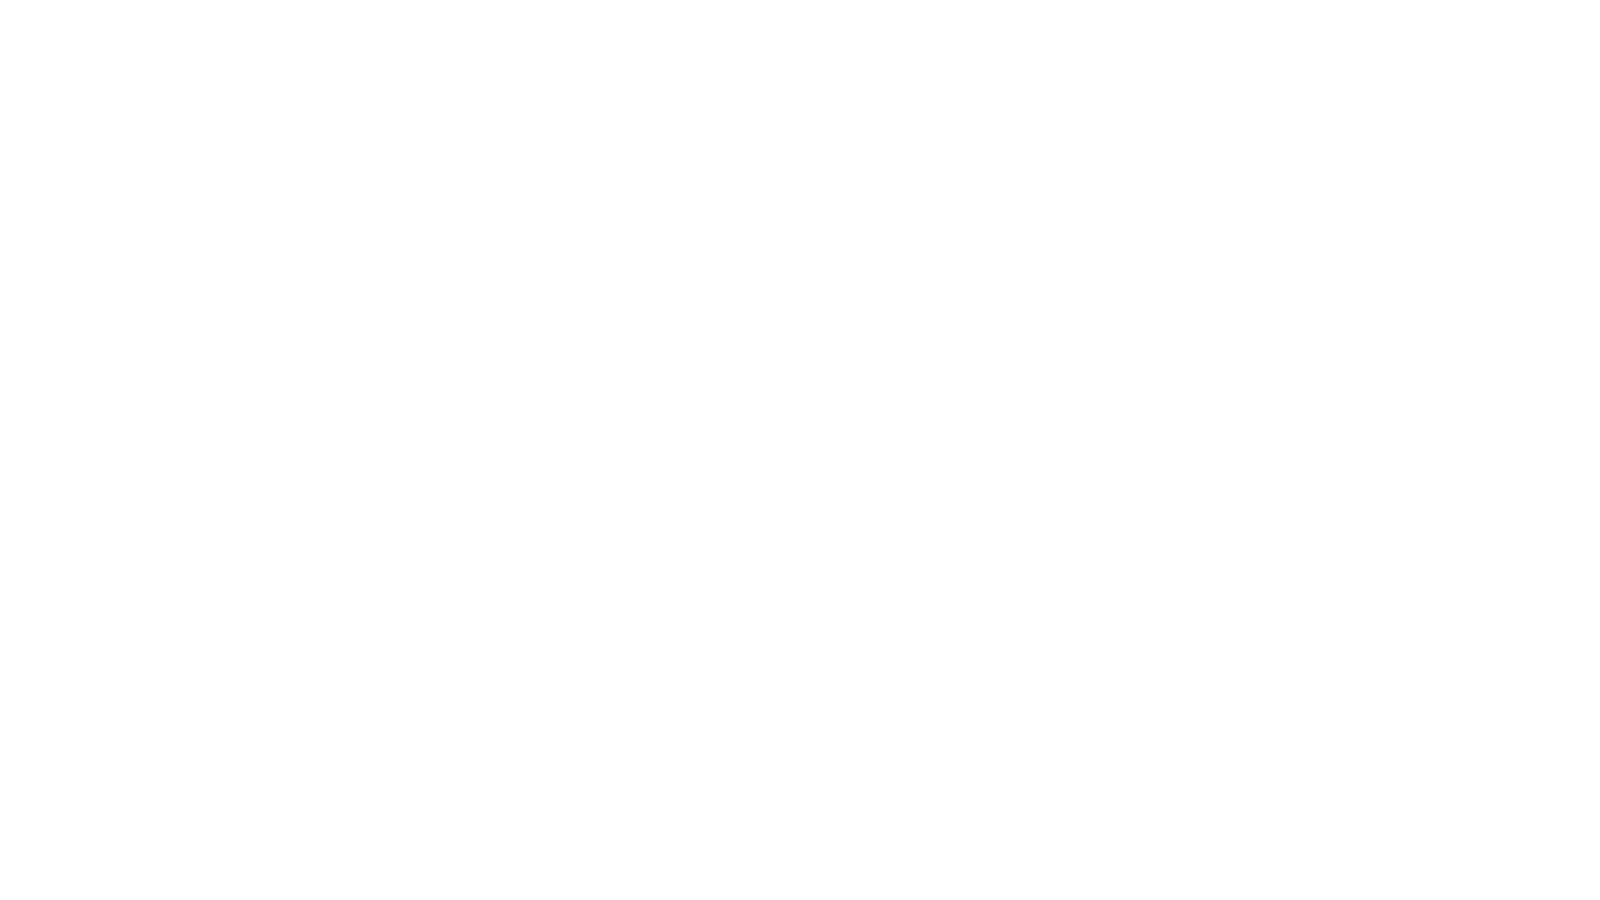 Hope is never so lost Choir: Hic et Nunc Director: Tobia Simone Tuveri Words by Ernest Hemingway Music by Tobia Simone Tuveri  SOCIAL Instagram: @corohicetnunc Facebook: @corohicetnunc Site: https://associazionehicetnunc.it/